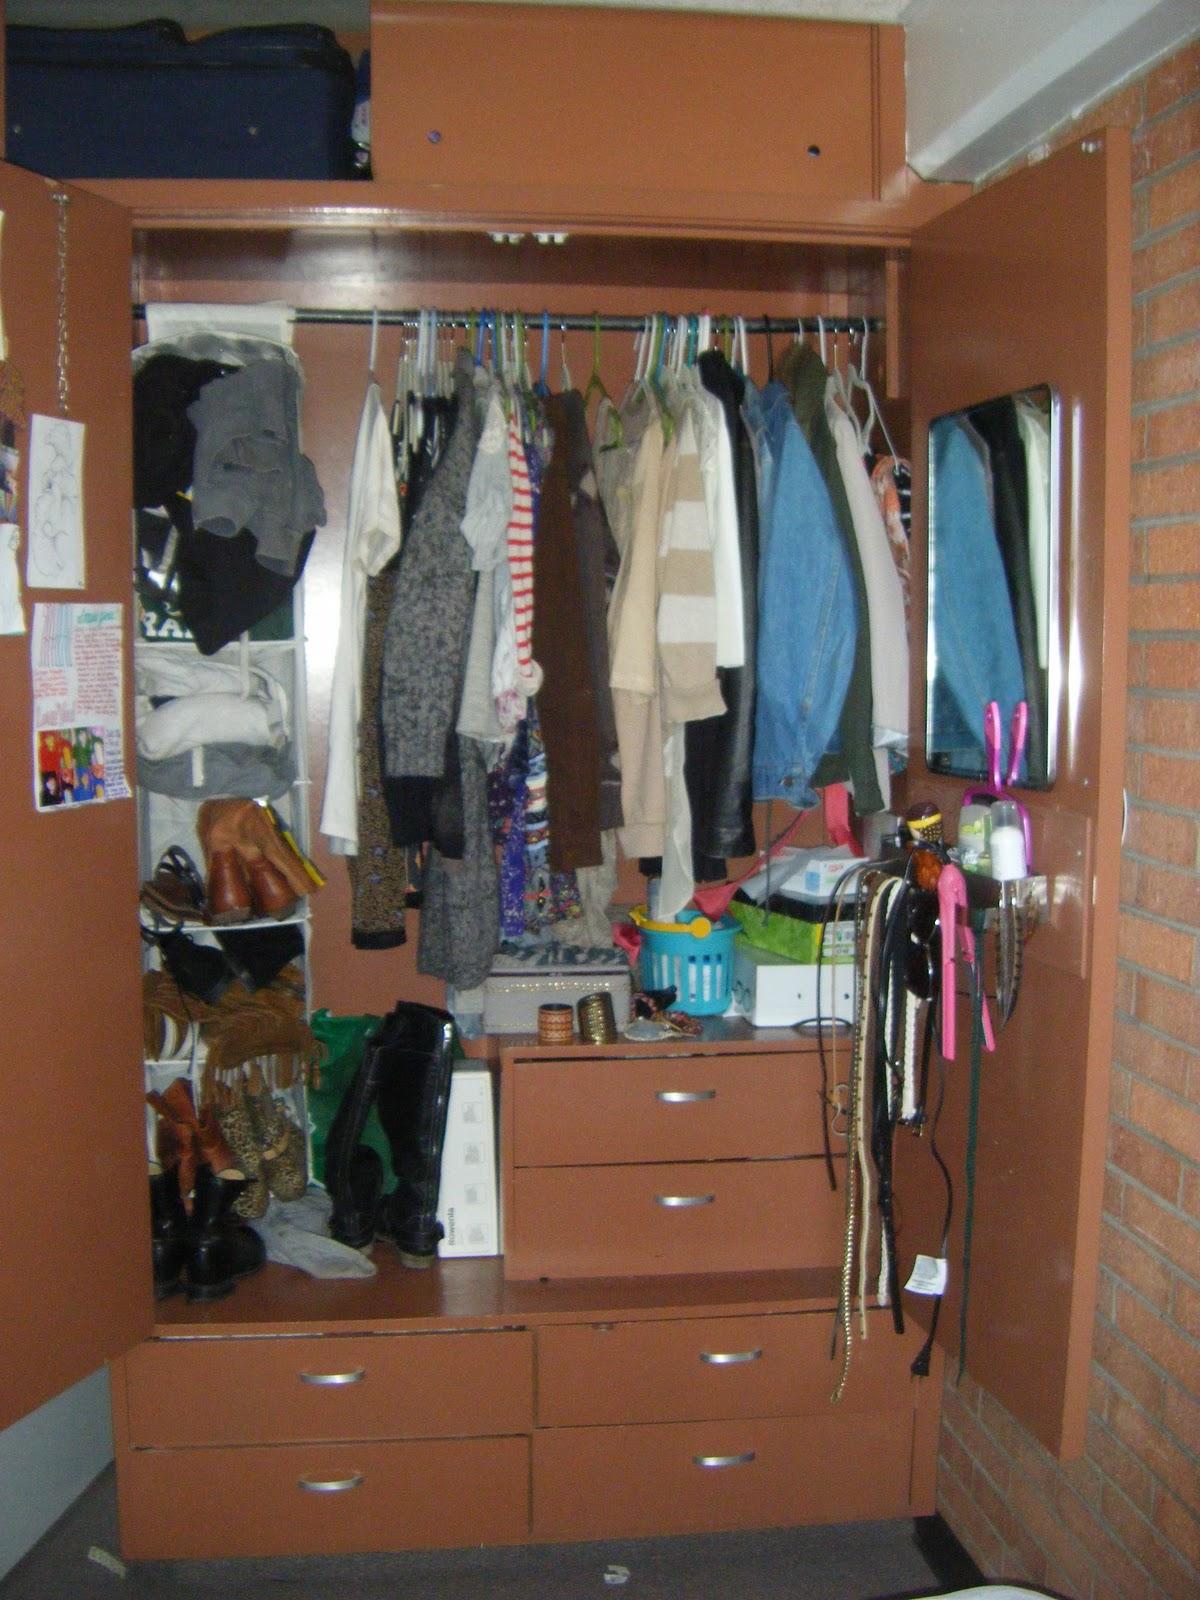 Dorm Room Closet: Dorm Life At CSU: Maximizing The Space In The Rooms